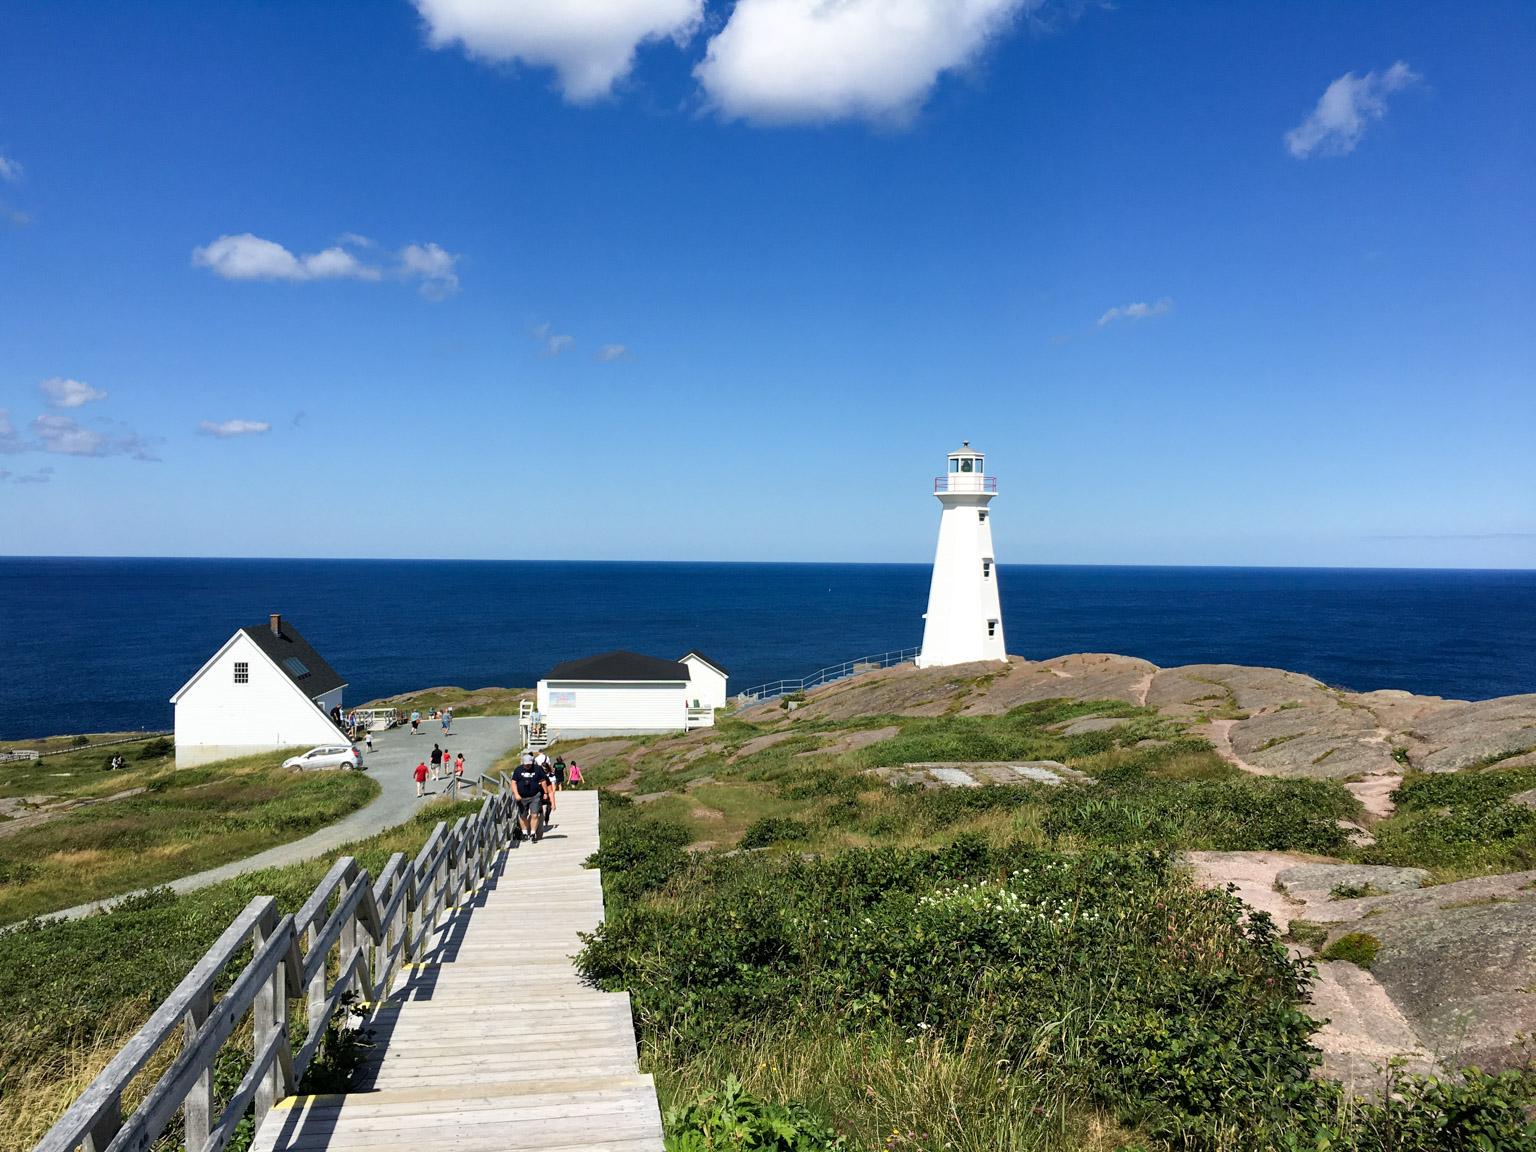 St. John's, Newfoundland August, 2016 • Douglas Stebila